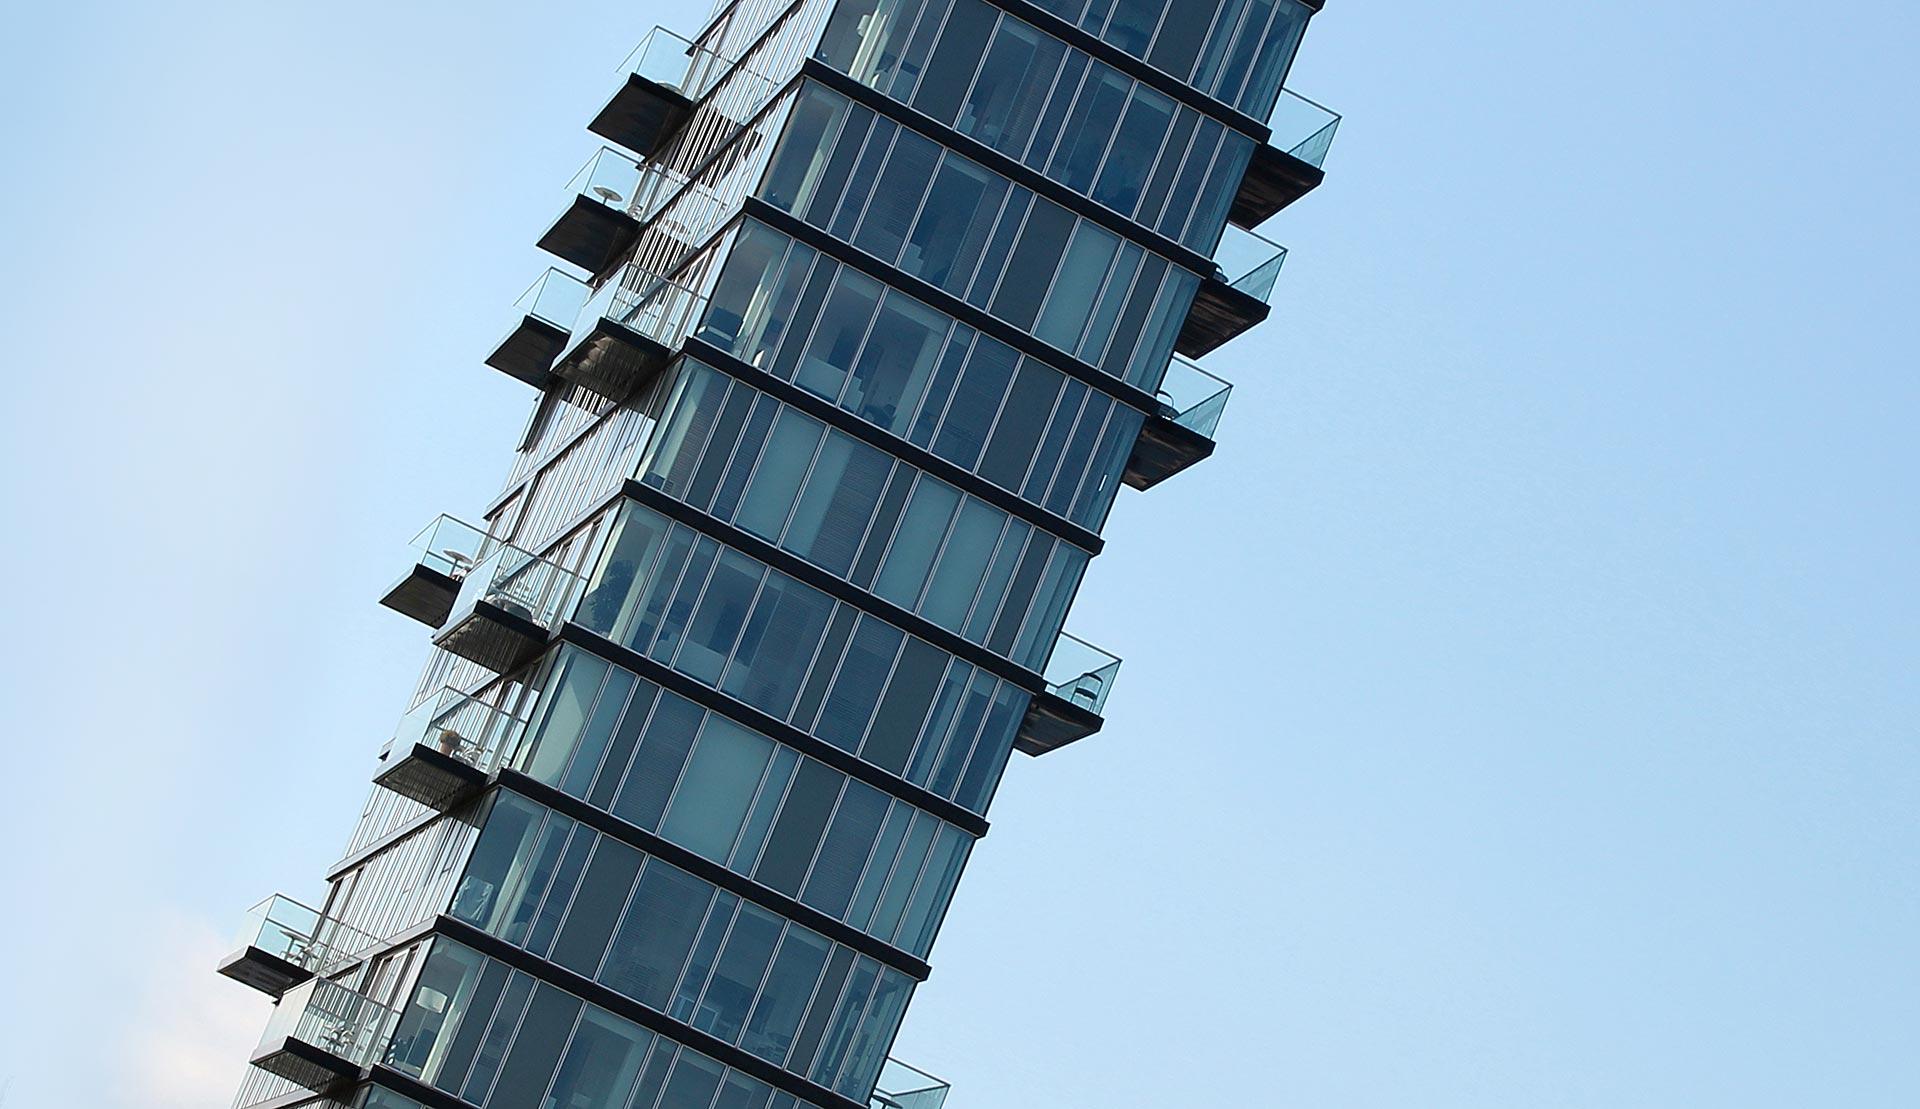 Architettura residenziale alto vetro dublino irlanda